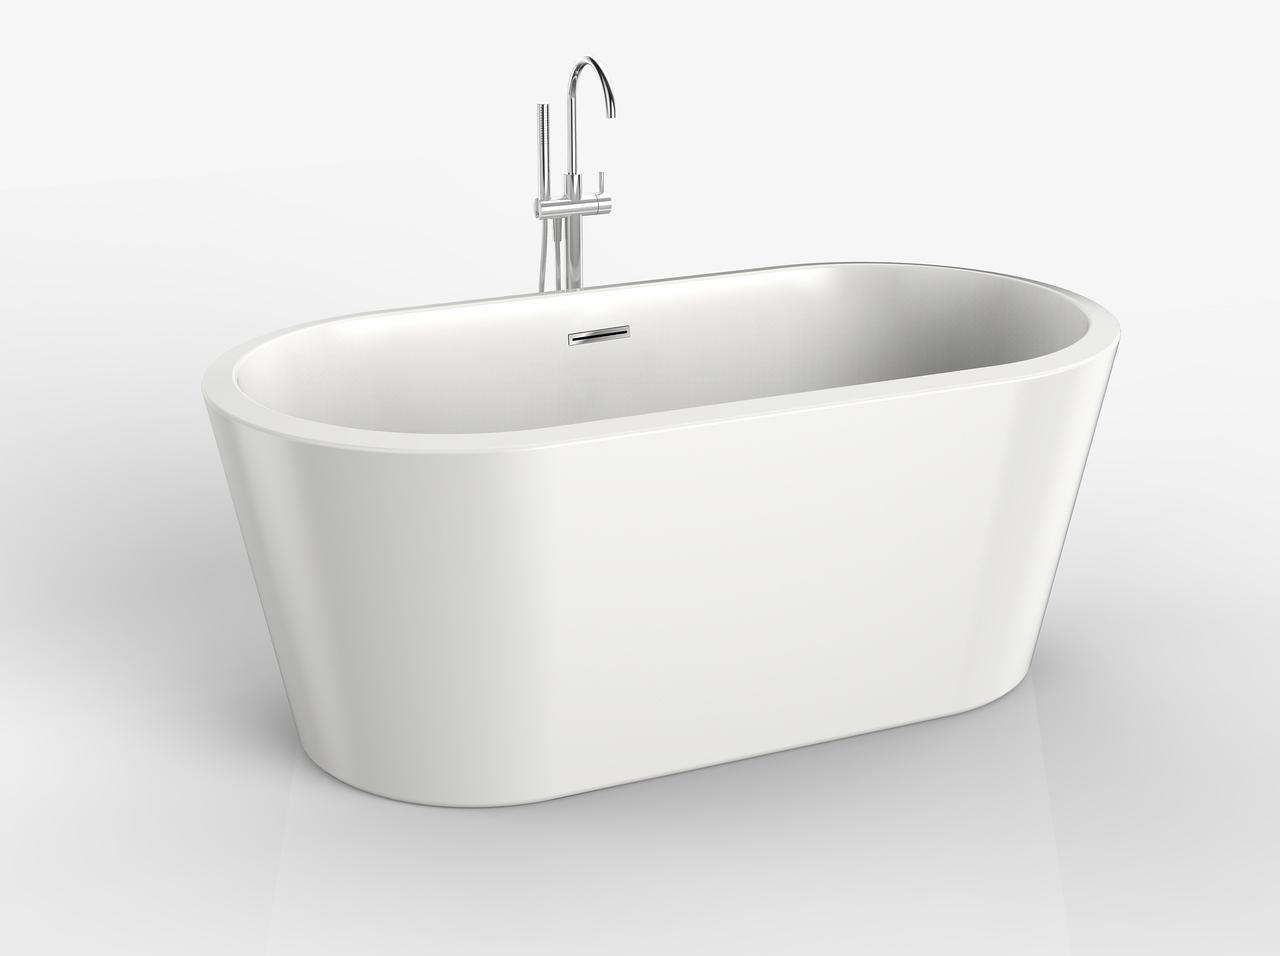 ″ regalia modern oval freestanding tub  ballade floormounted  - ″ regalia modern oval freestanding tub  ballade floormounted tub filler